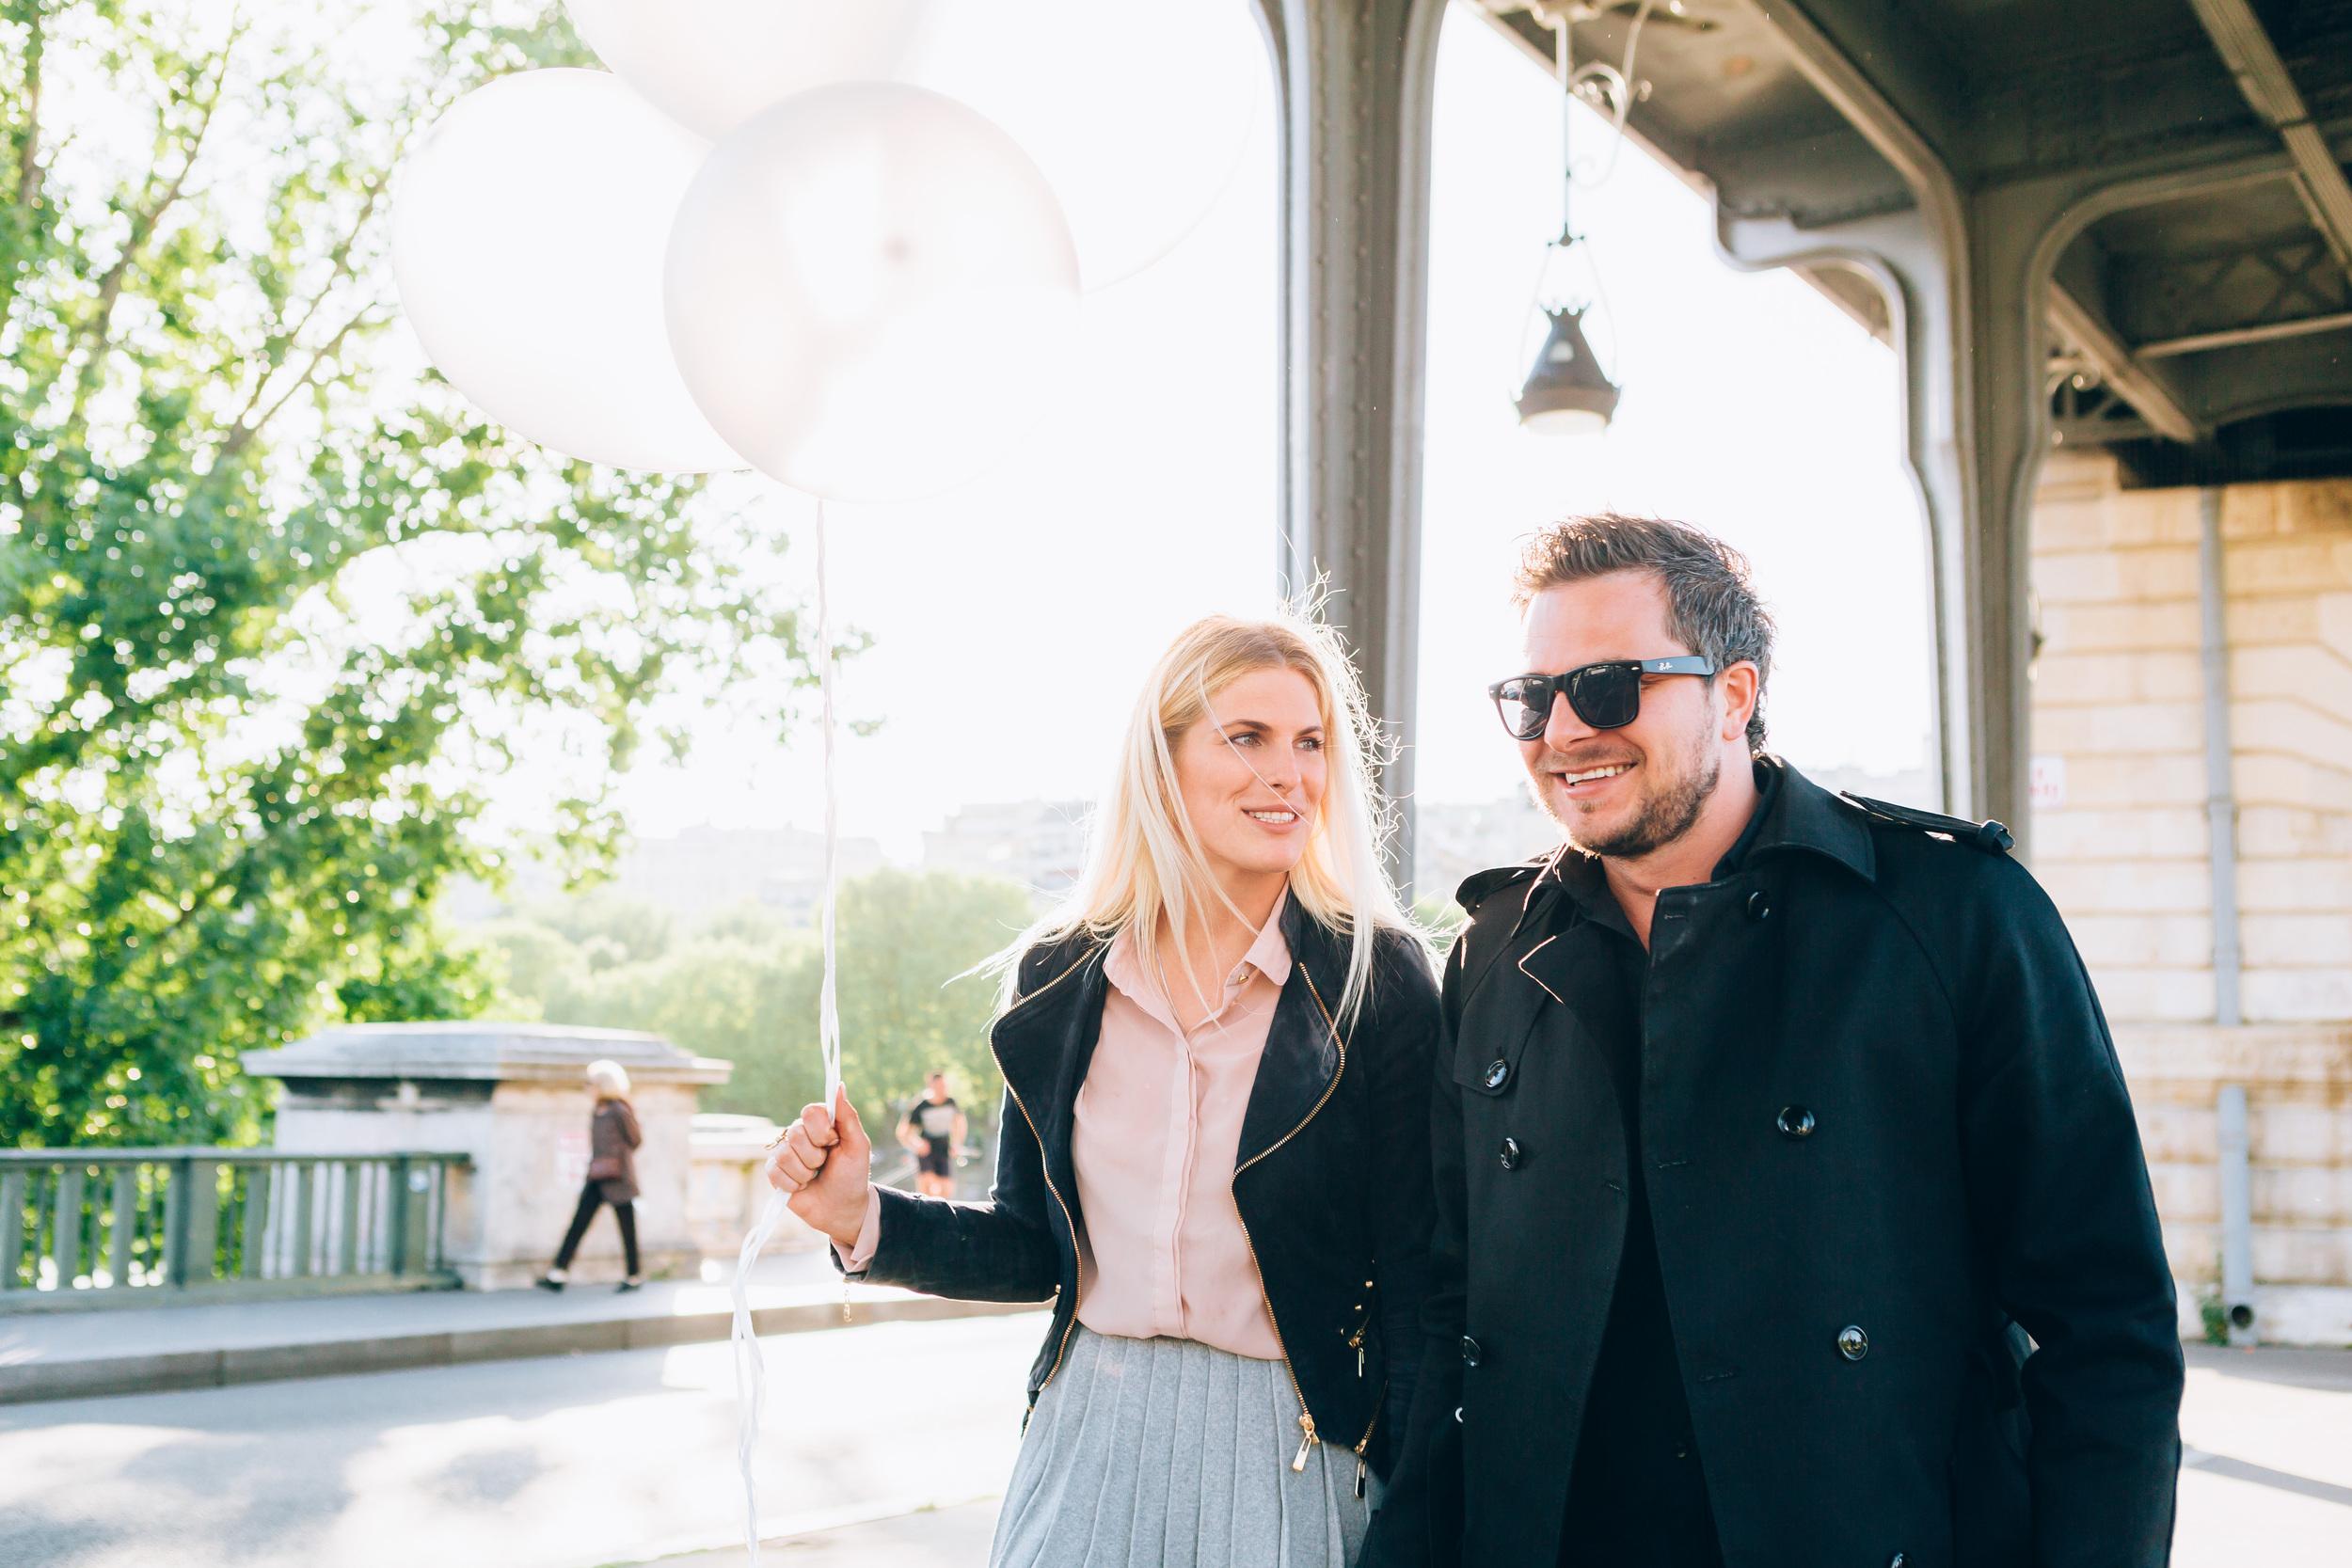 Photographer in Paris, Surprise Proposal, Bir Hakeim, Eiffel Tower, Engagement, Iheartparisfr